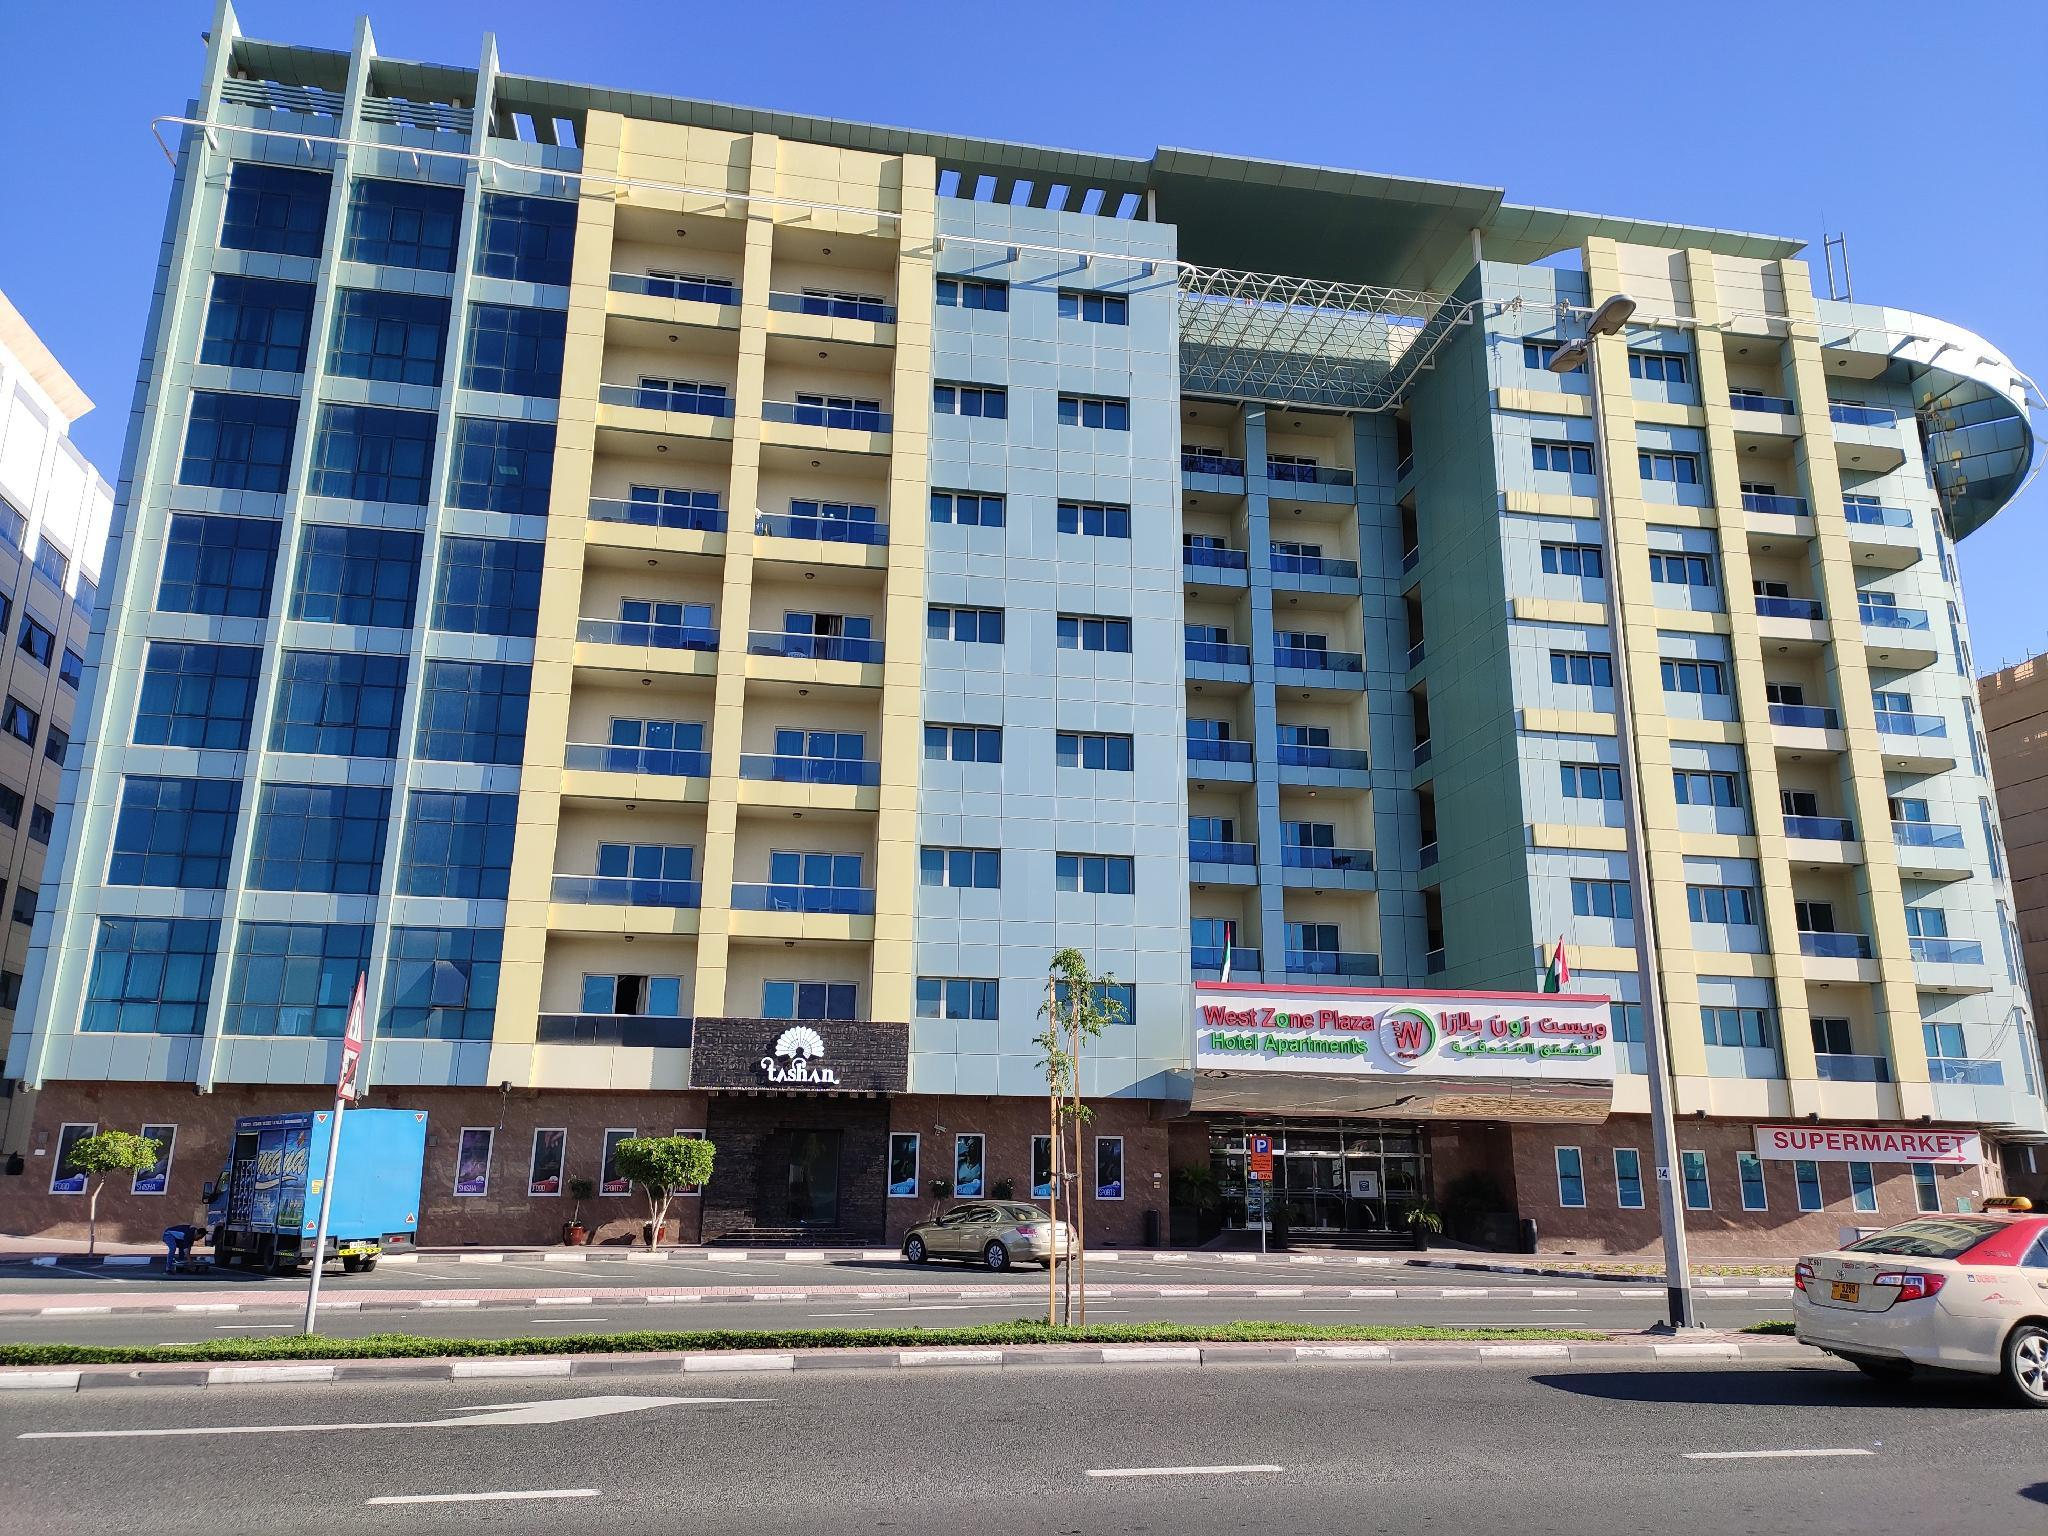 West Zone Plaza Hotel Apartments – Dubai 1